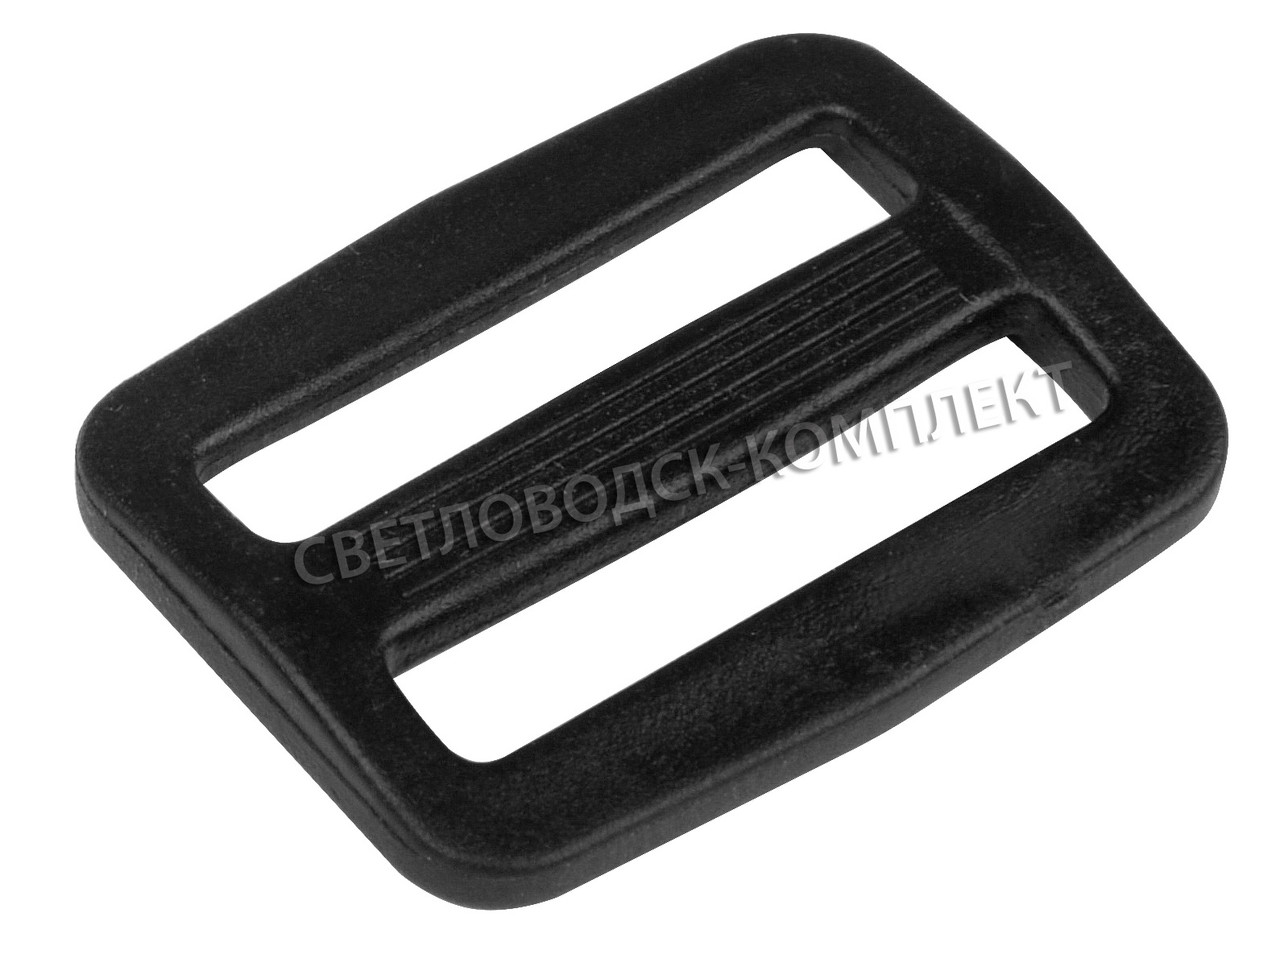 Пряжка 2-х щелевая 25 мм пластик, цв. чёрный, арт. РП/2-2514